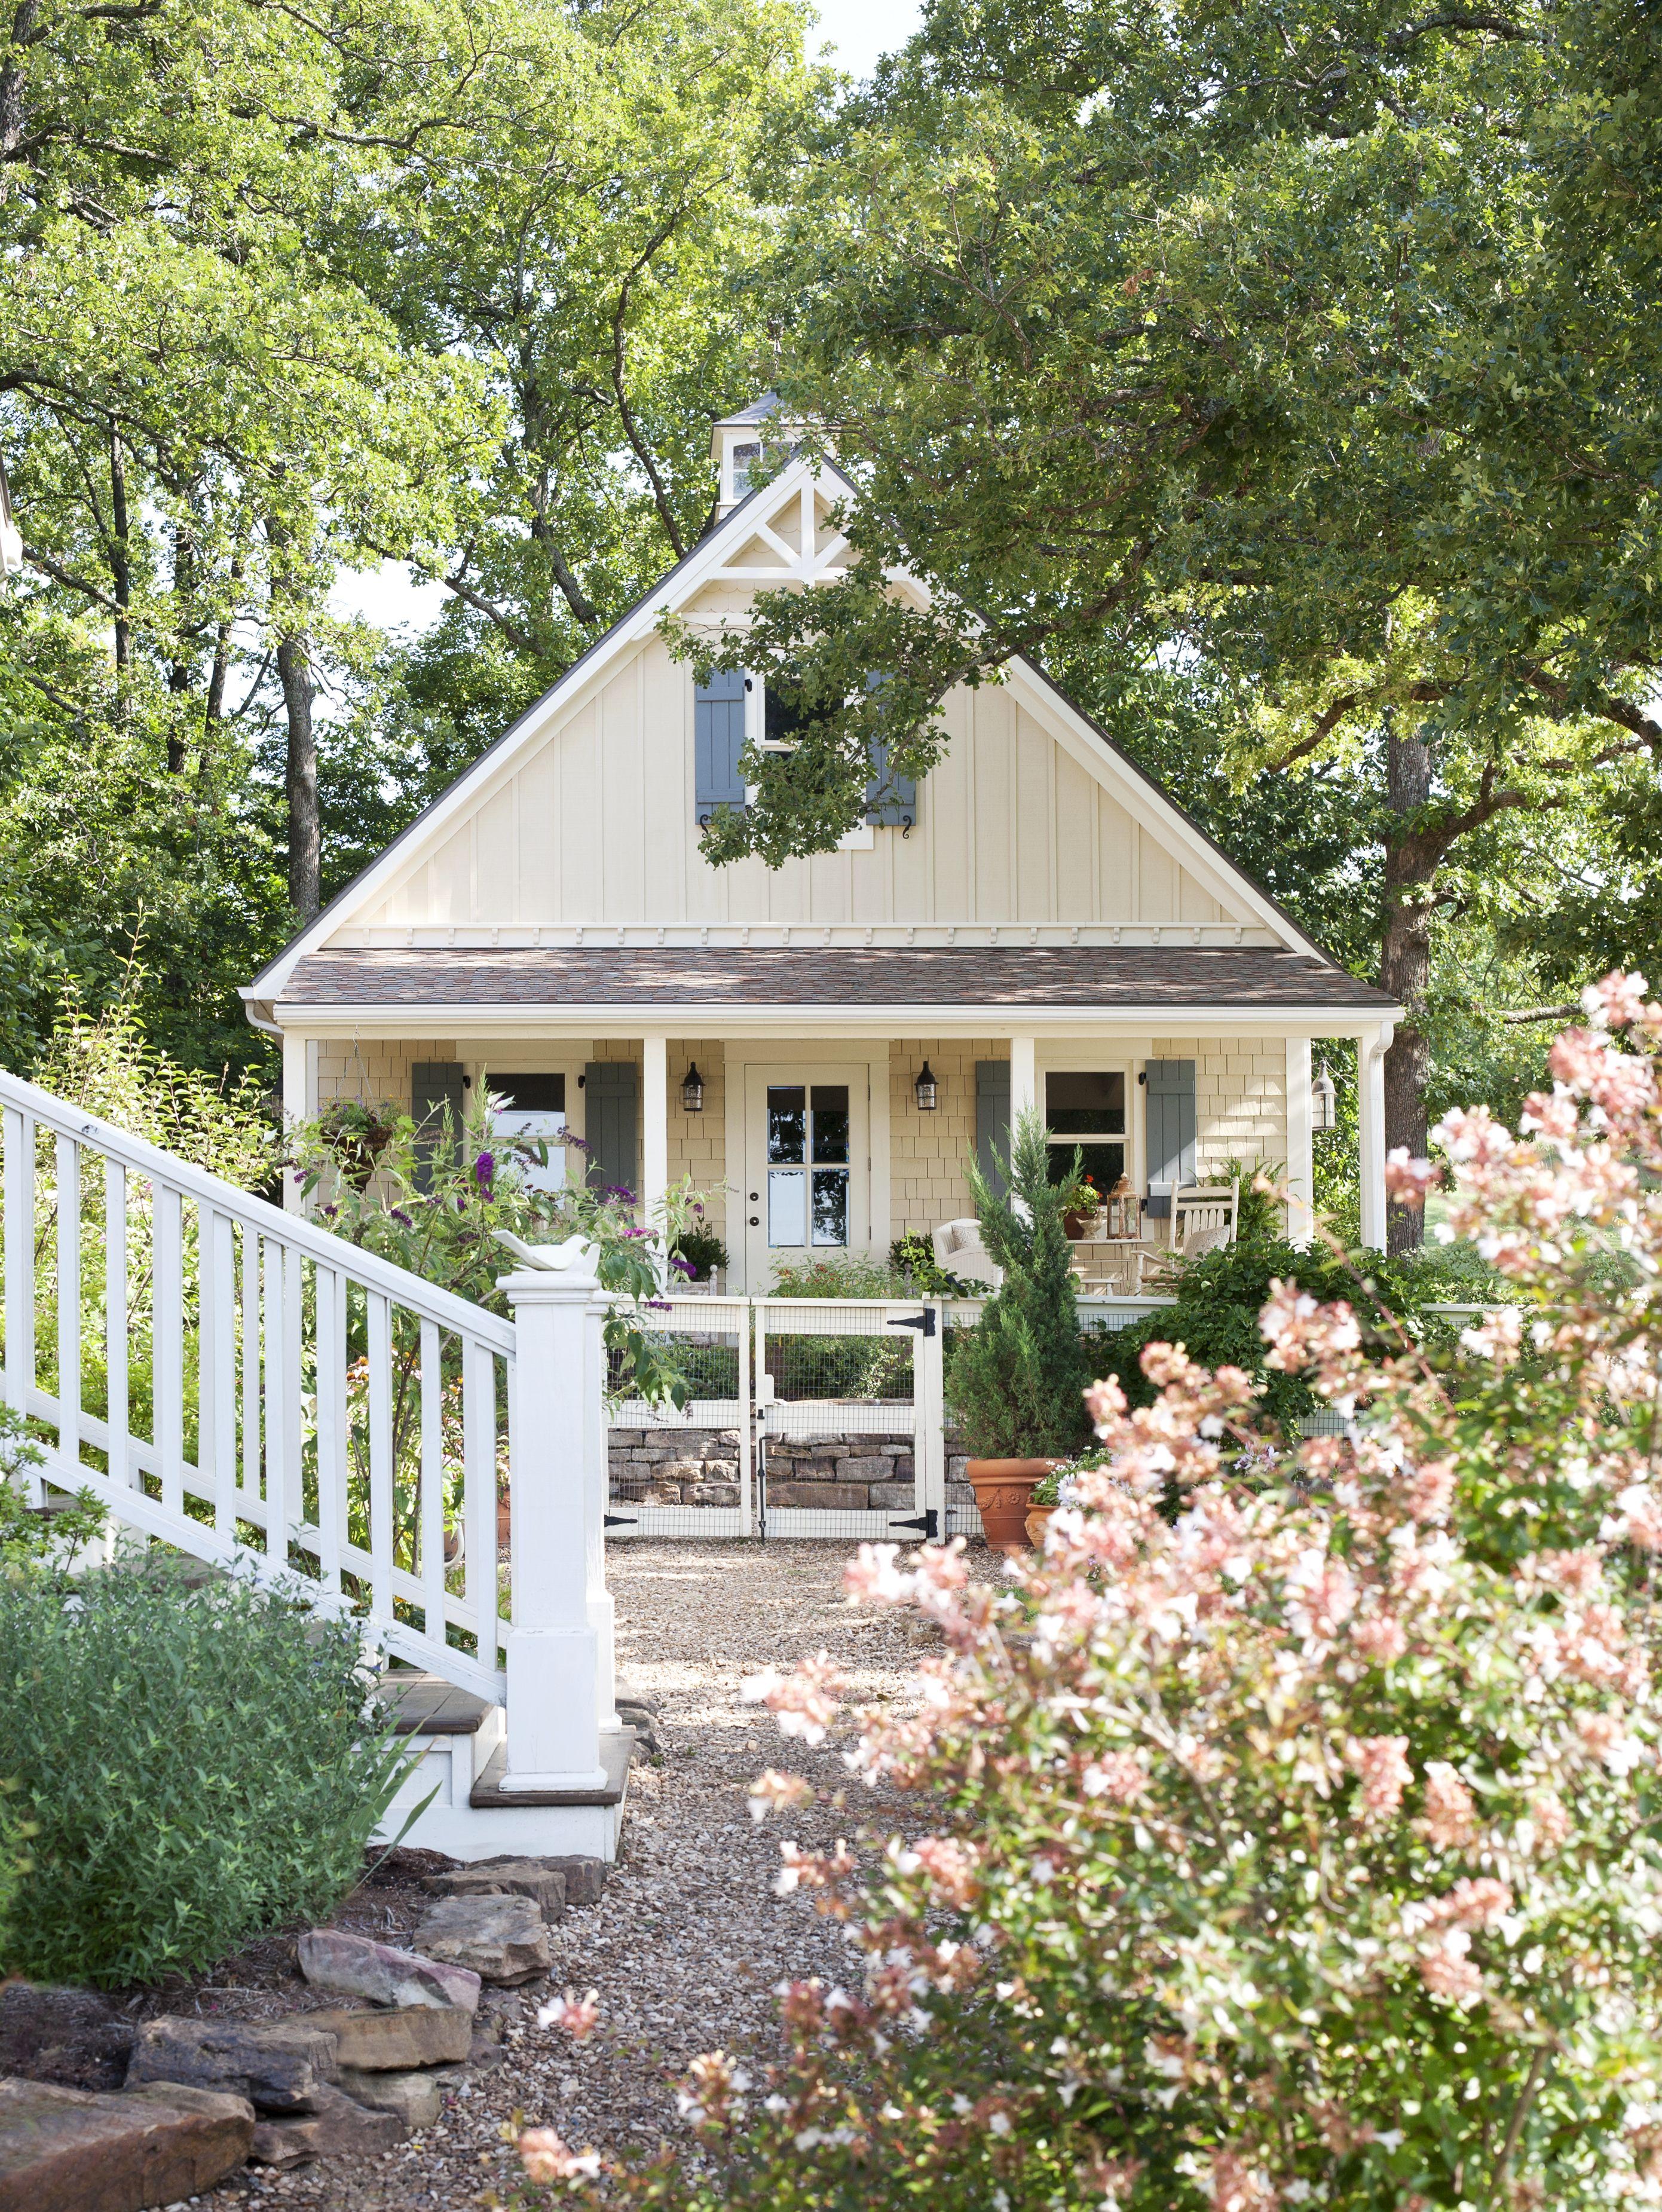 rooms with a view home exteriors pinterest haus landhaus und wohnen. Black Bedroom Furniture Sets. Home Design Ideas